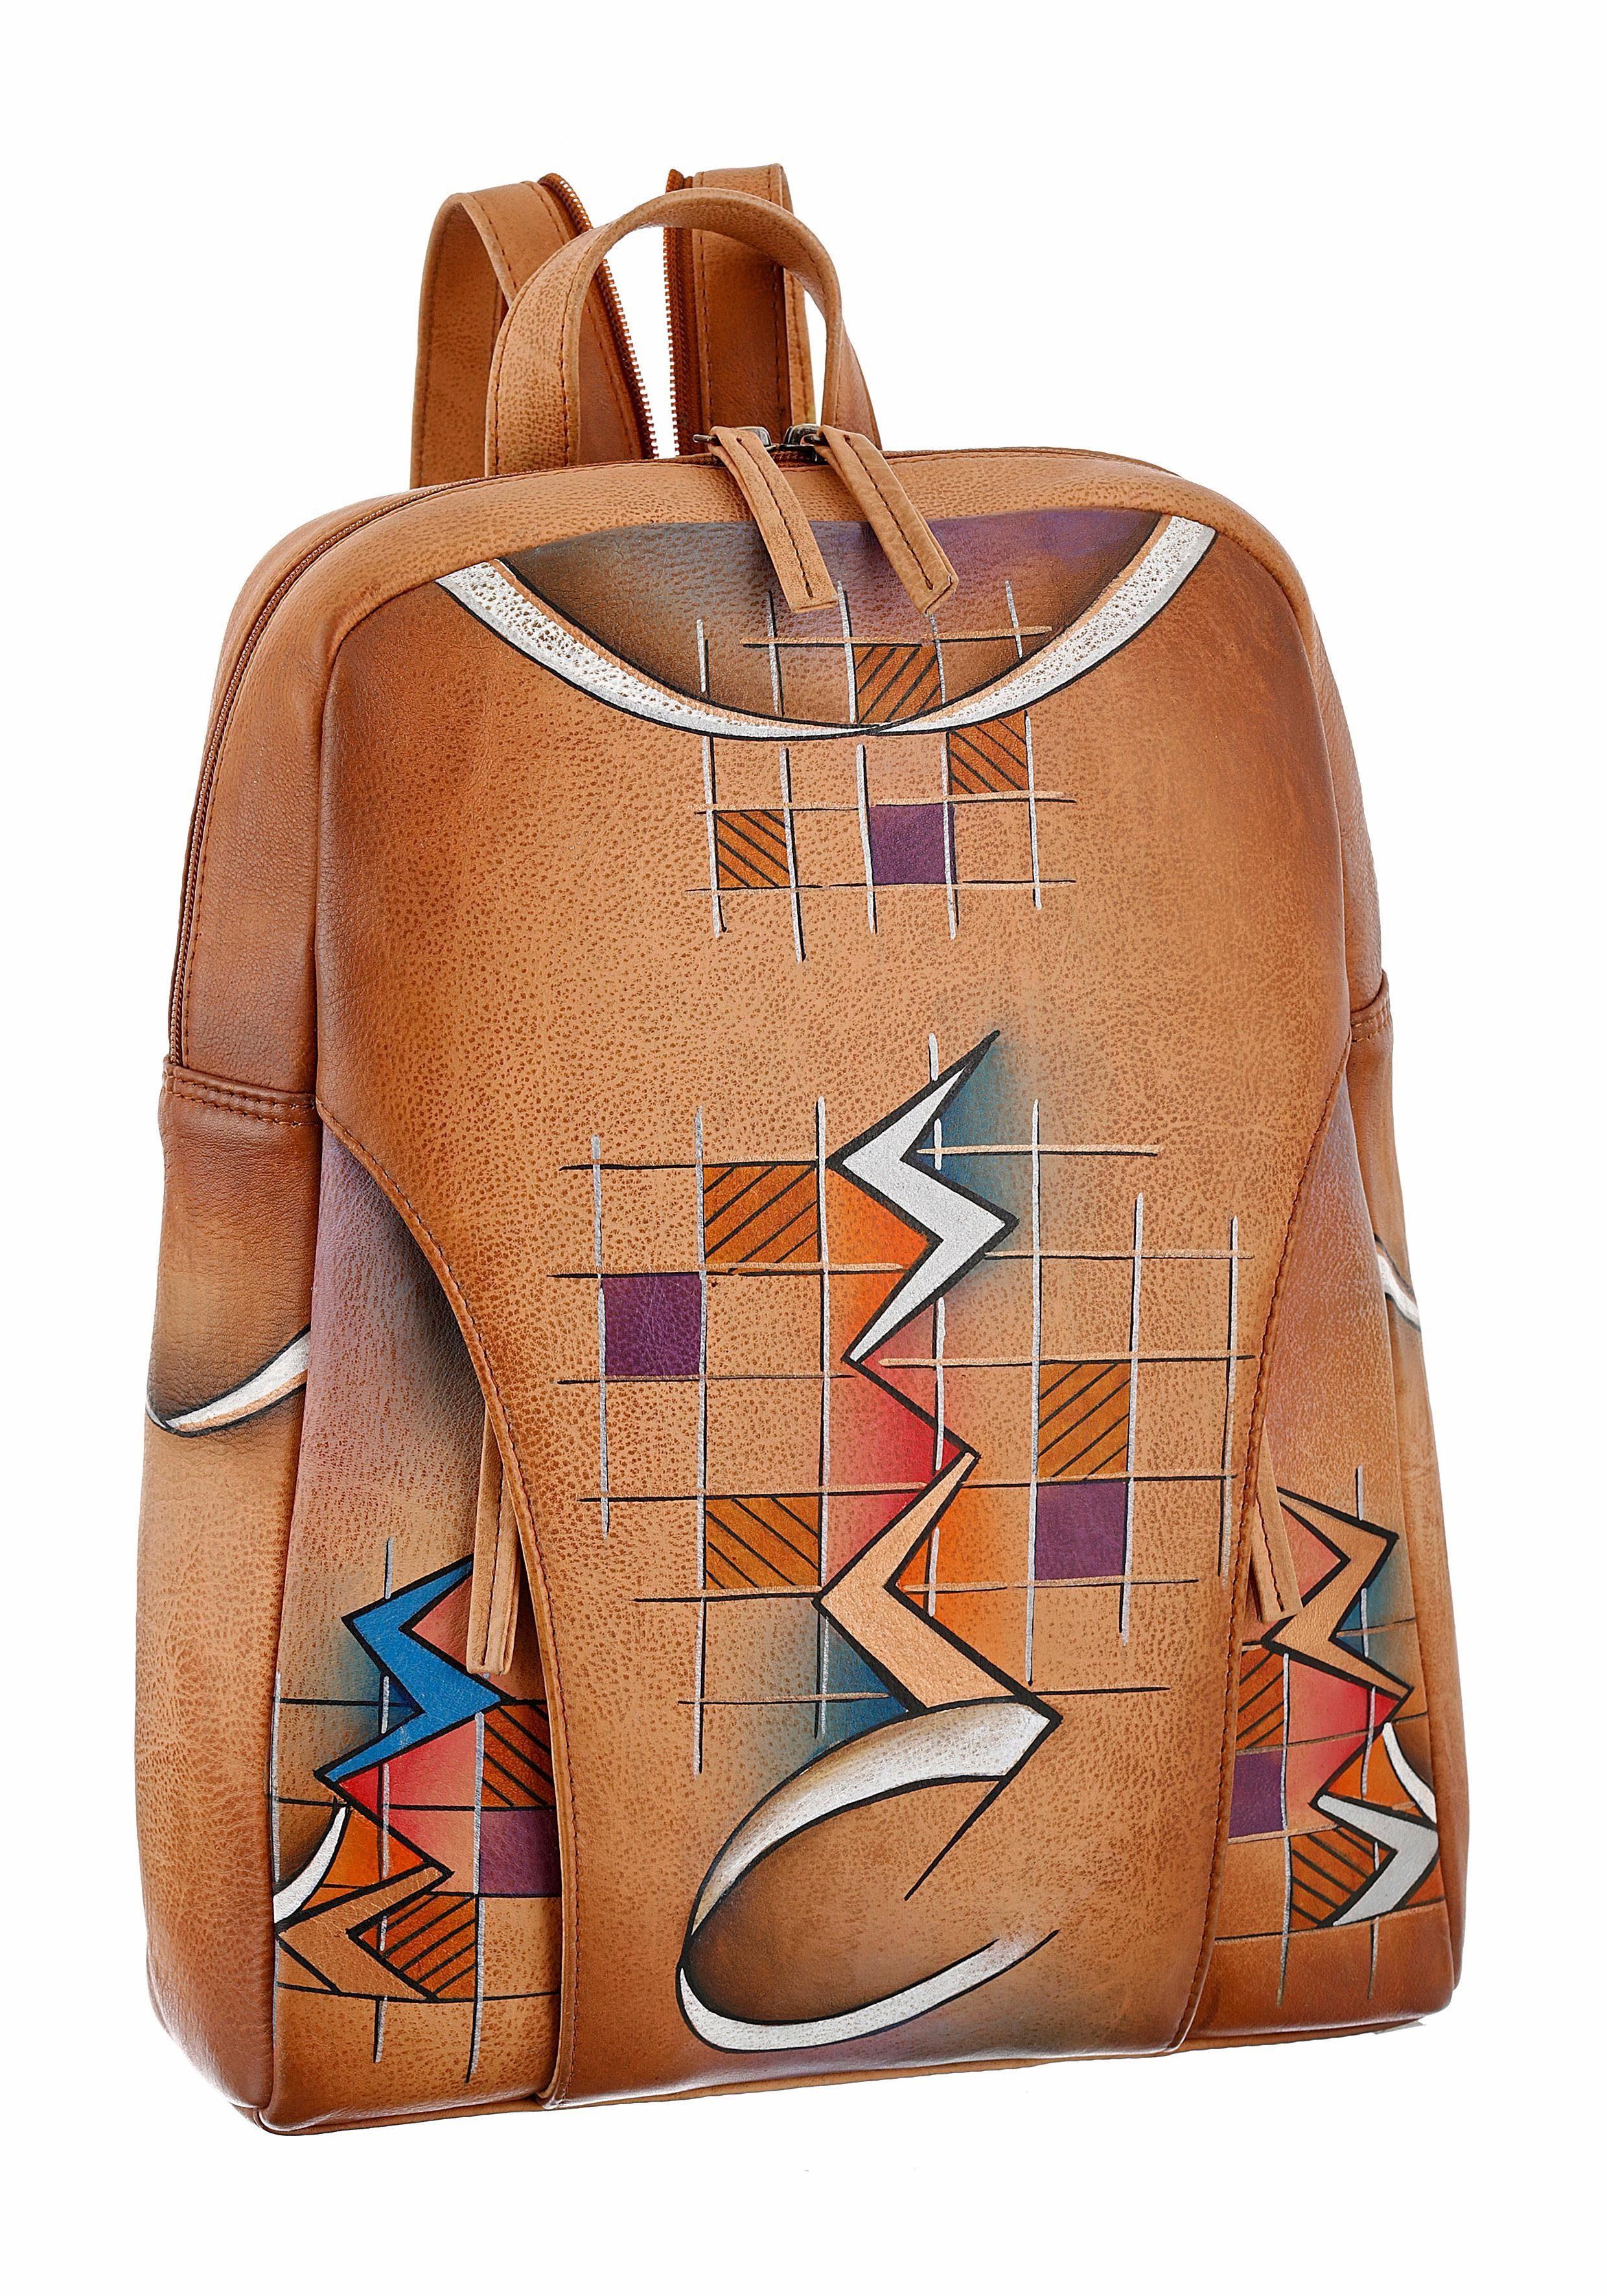 Art & Craft Cityrucksack, by Greenland Nature aus handbemaltem Leder